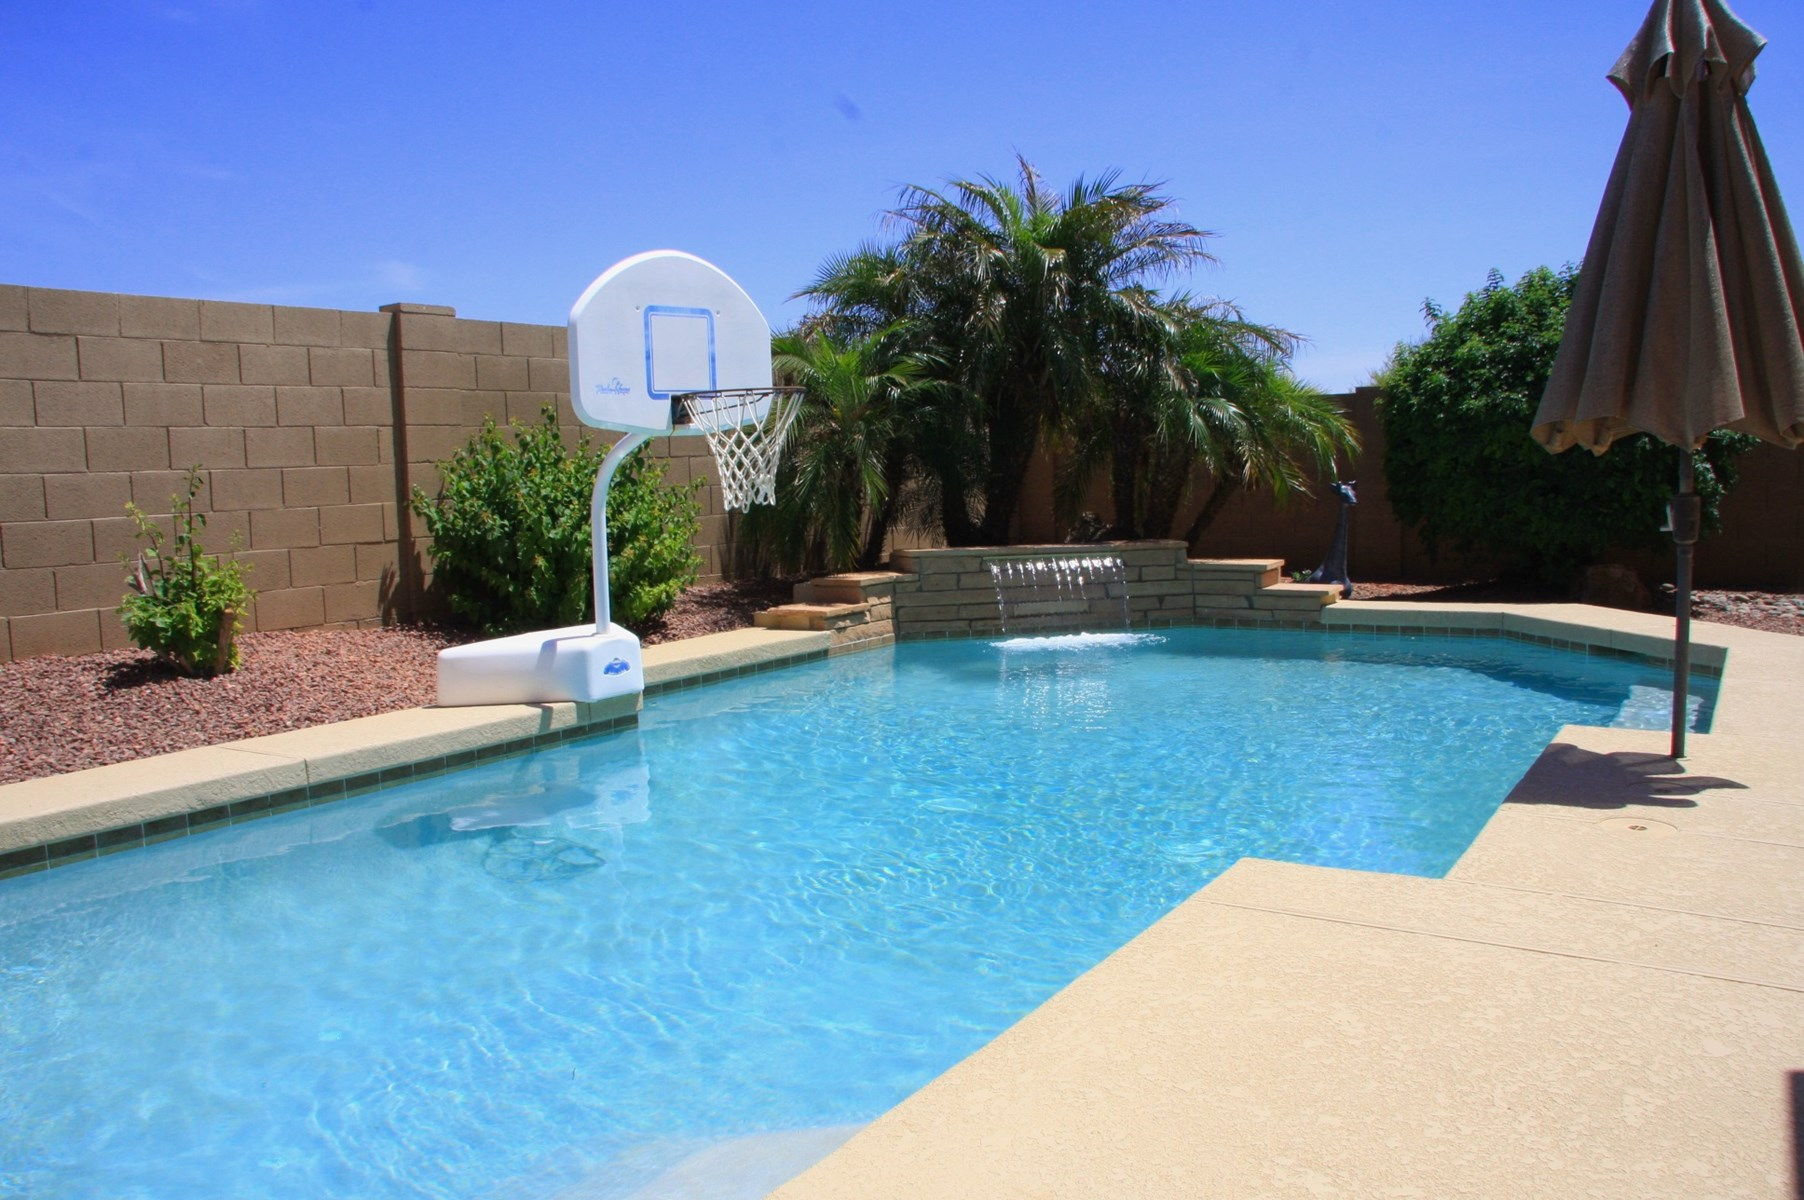 Home for sale Casa Grande AZ Home with pool for sale Arizona